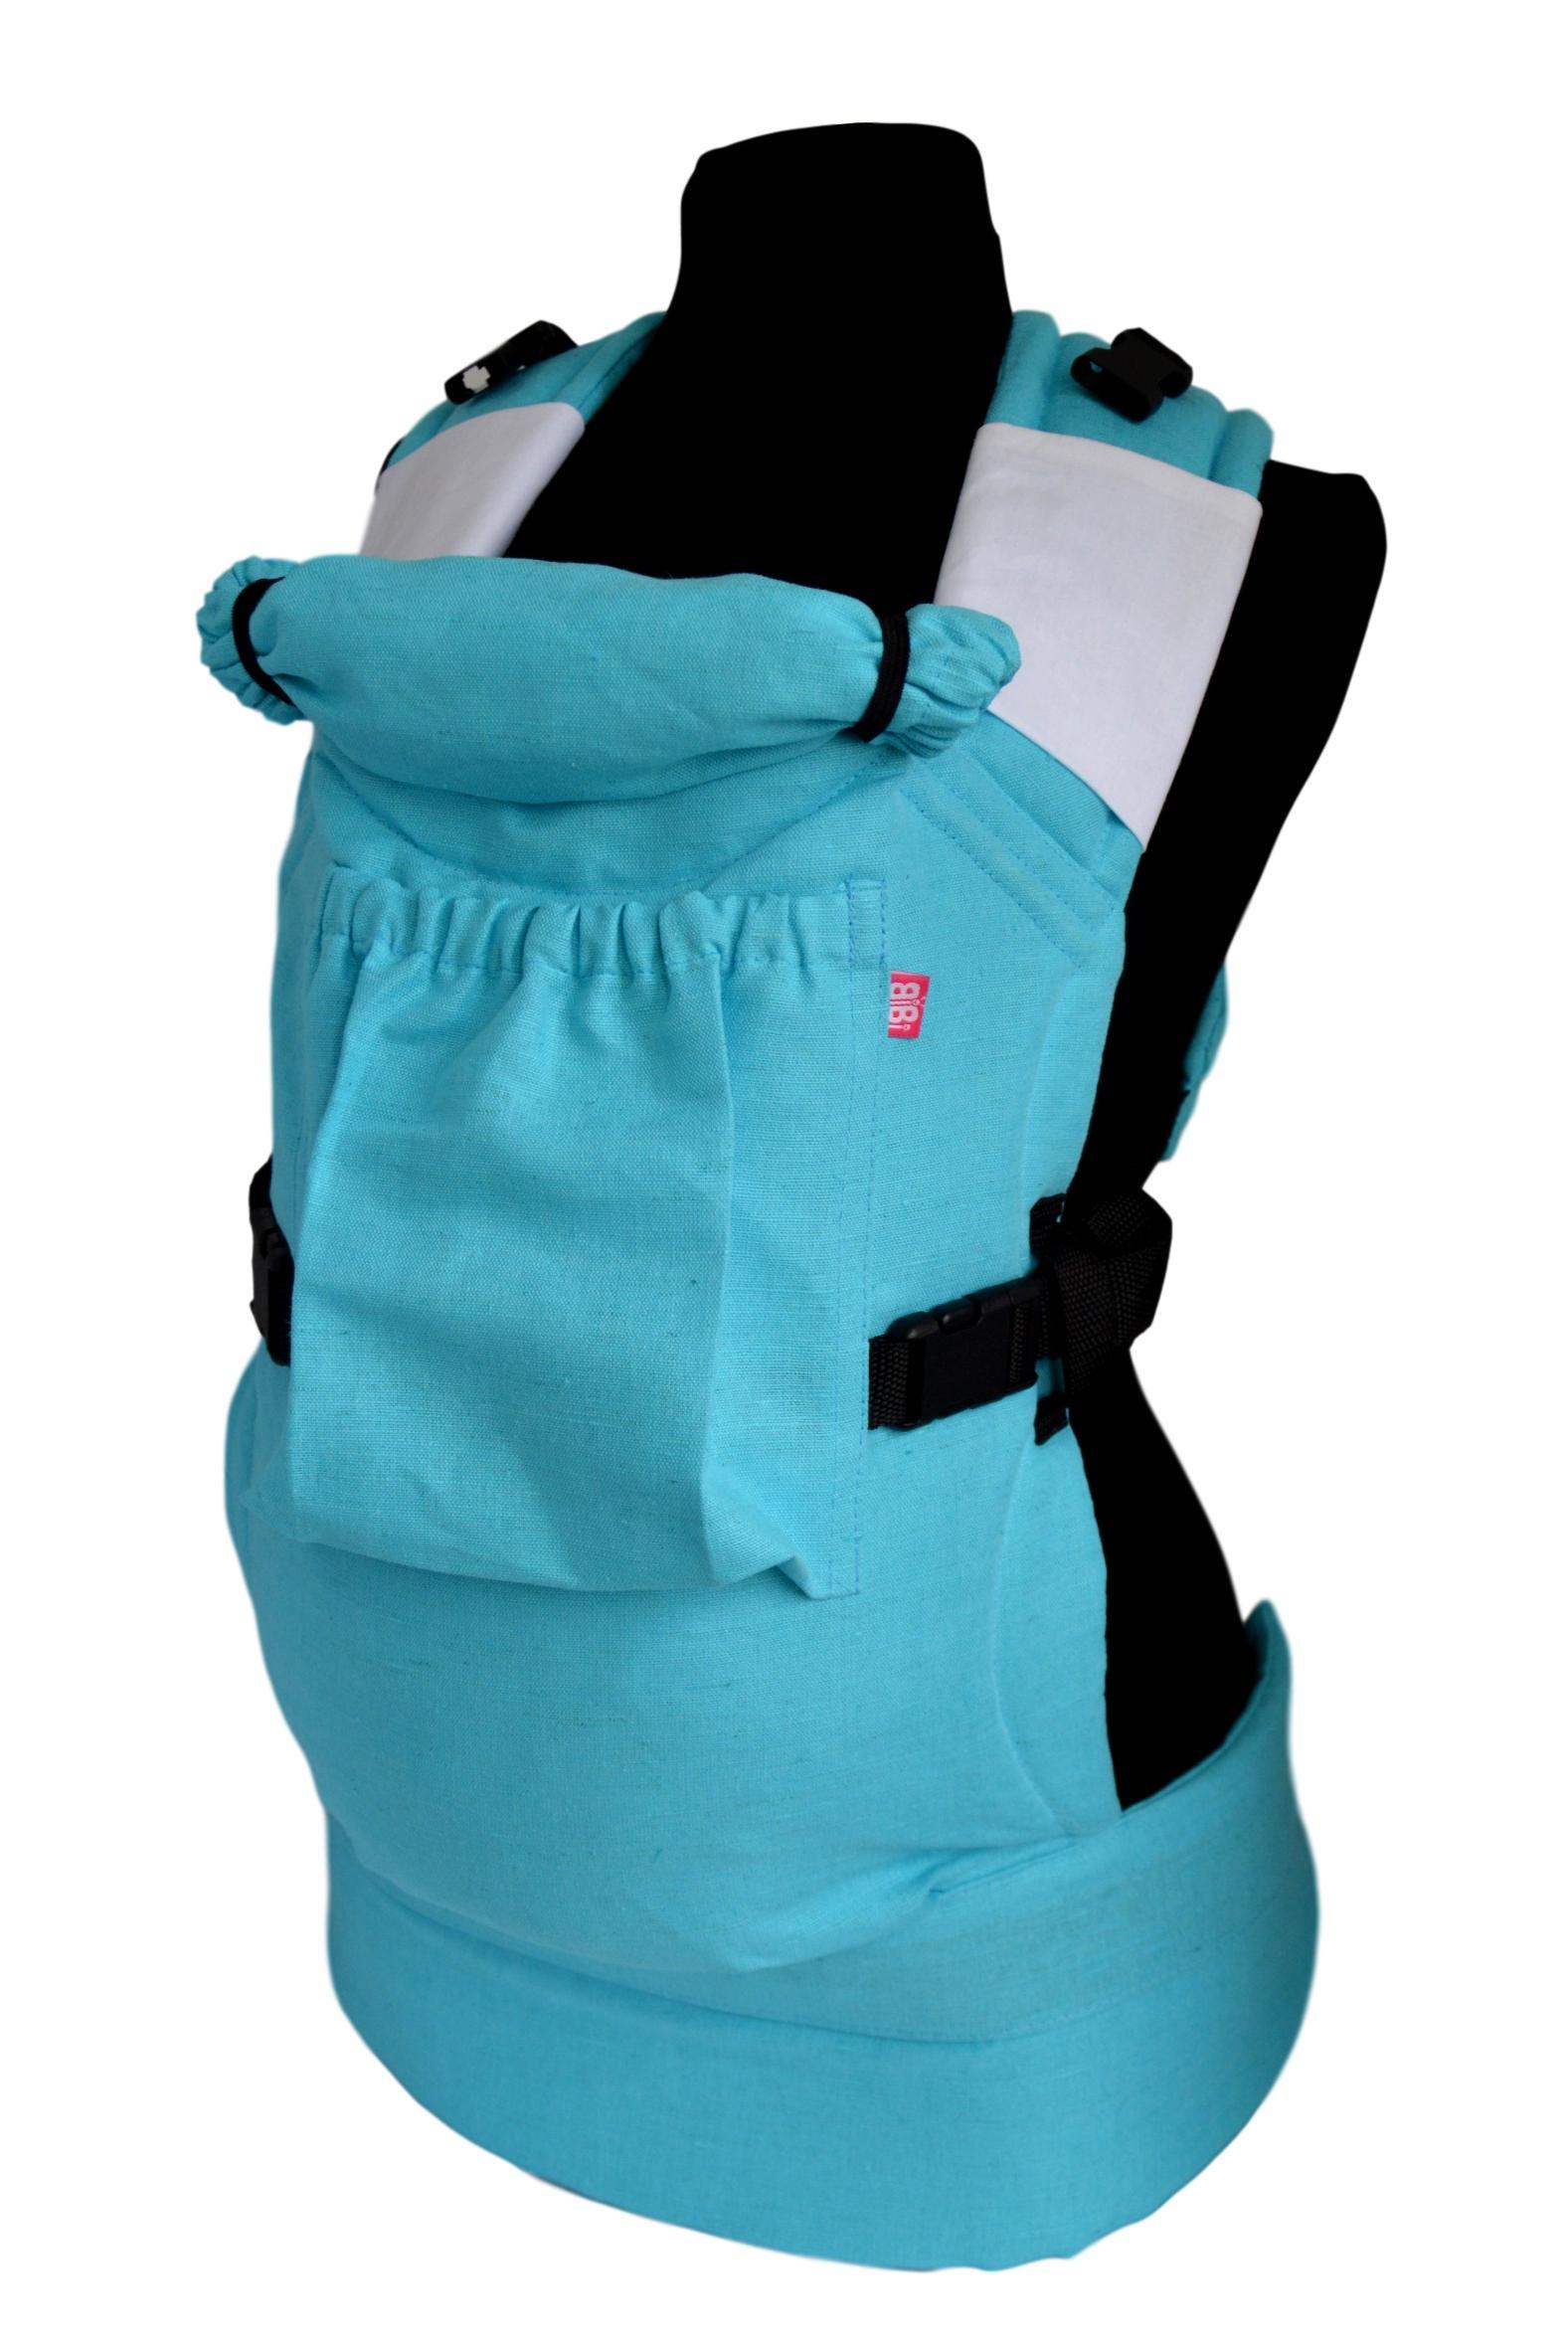 рюкзак переноска риббис bibi лён сиреневый Эрго-рюкзак BiBi-Лён (цвет бирюзовый)